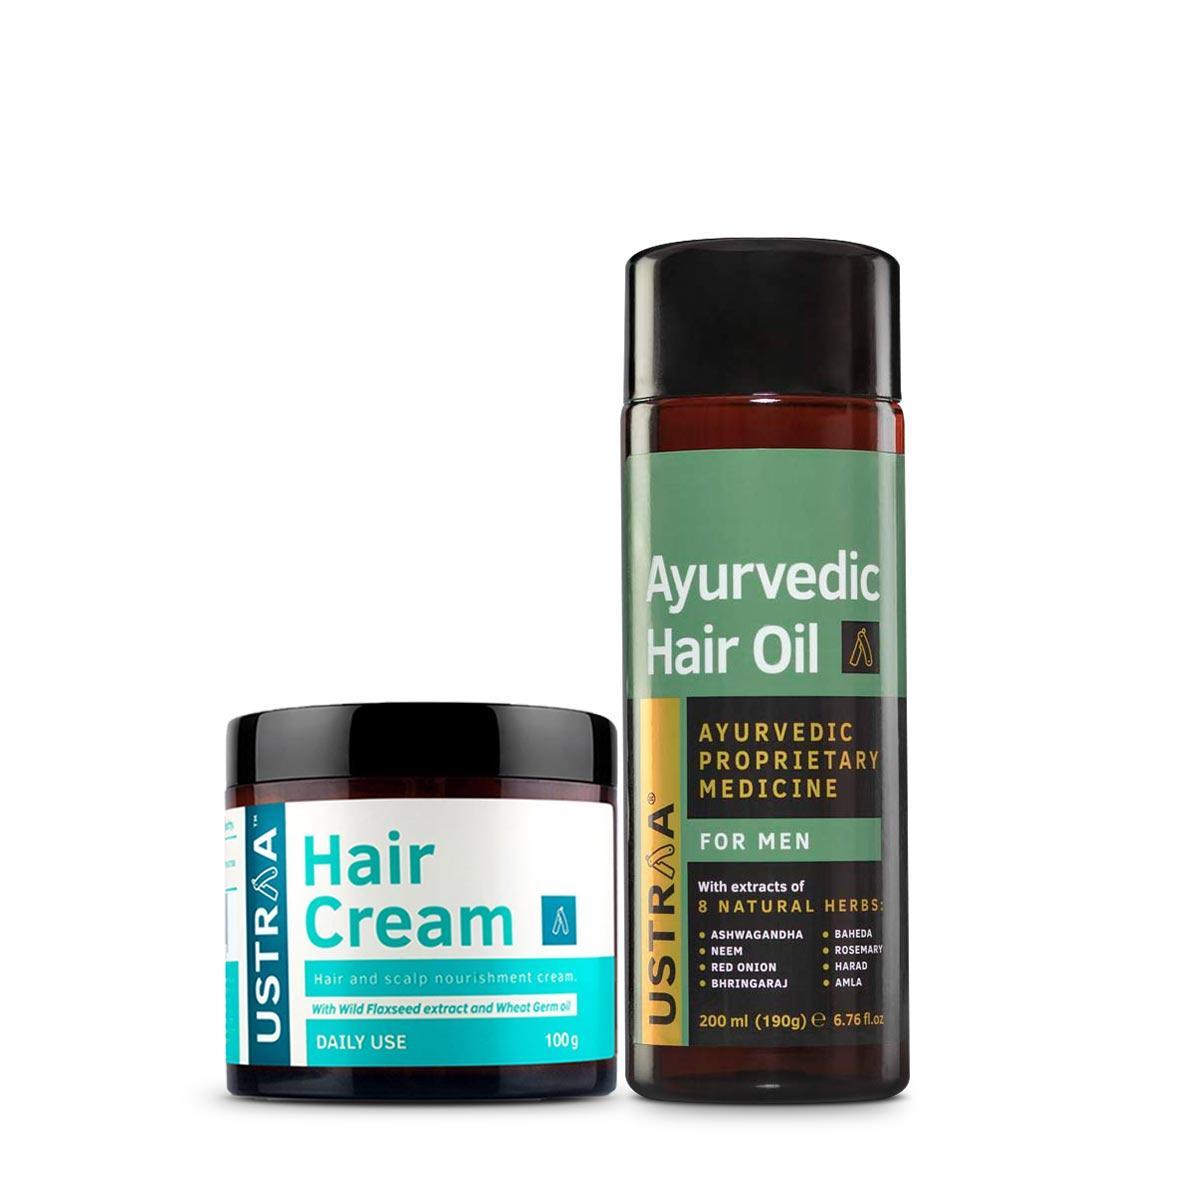 Ustraa Hair Cream- Daily Use + Ayurvedic Hair Oil For Men: Set of 2